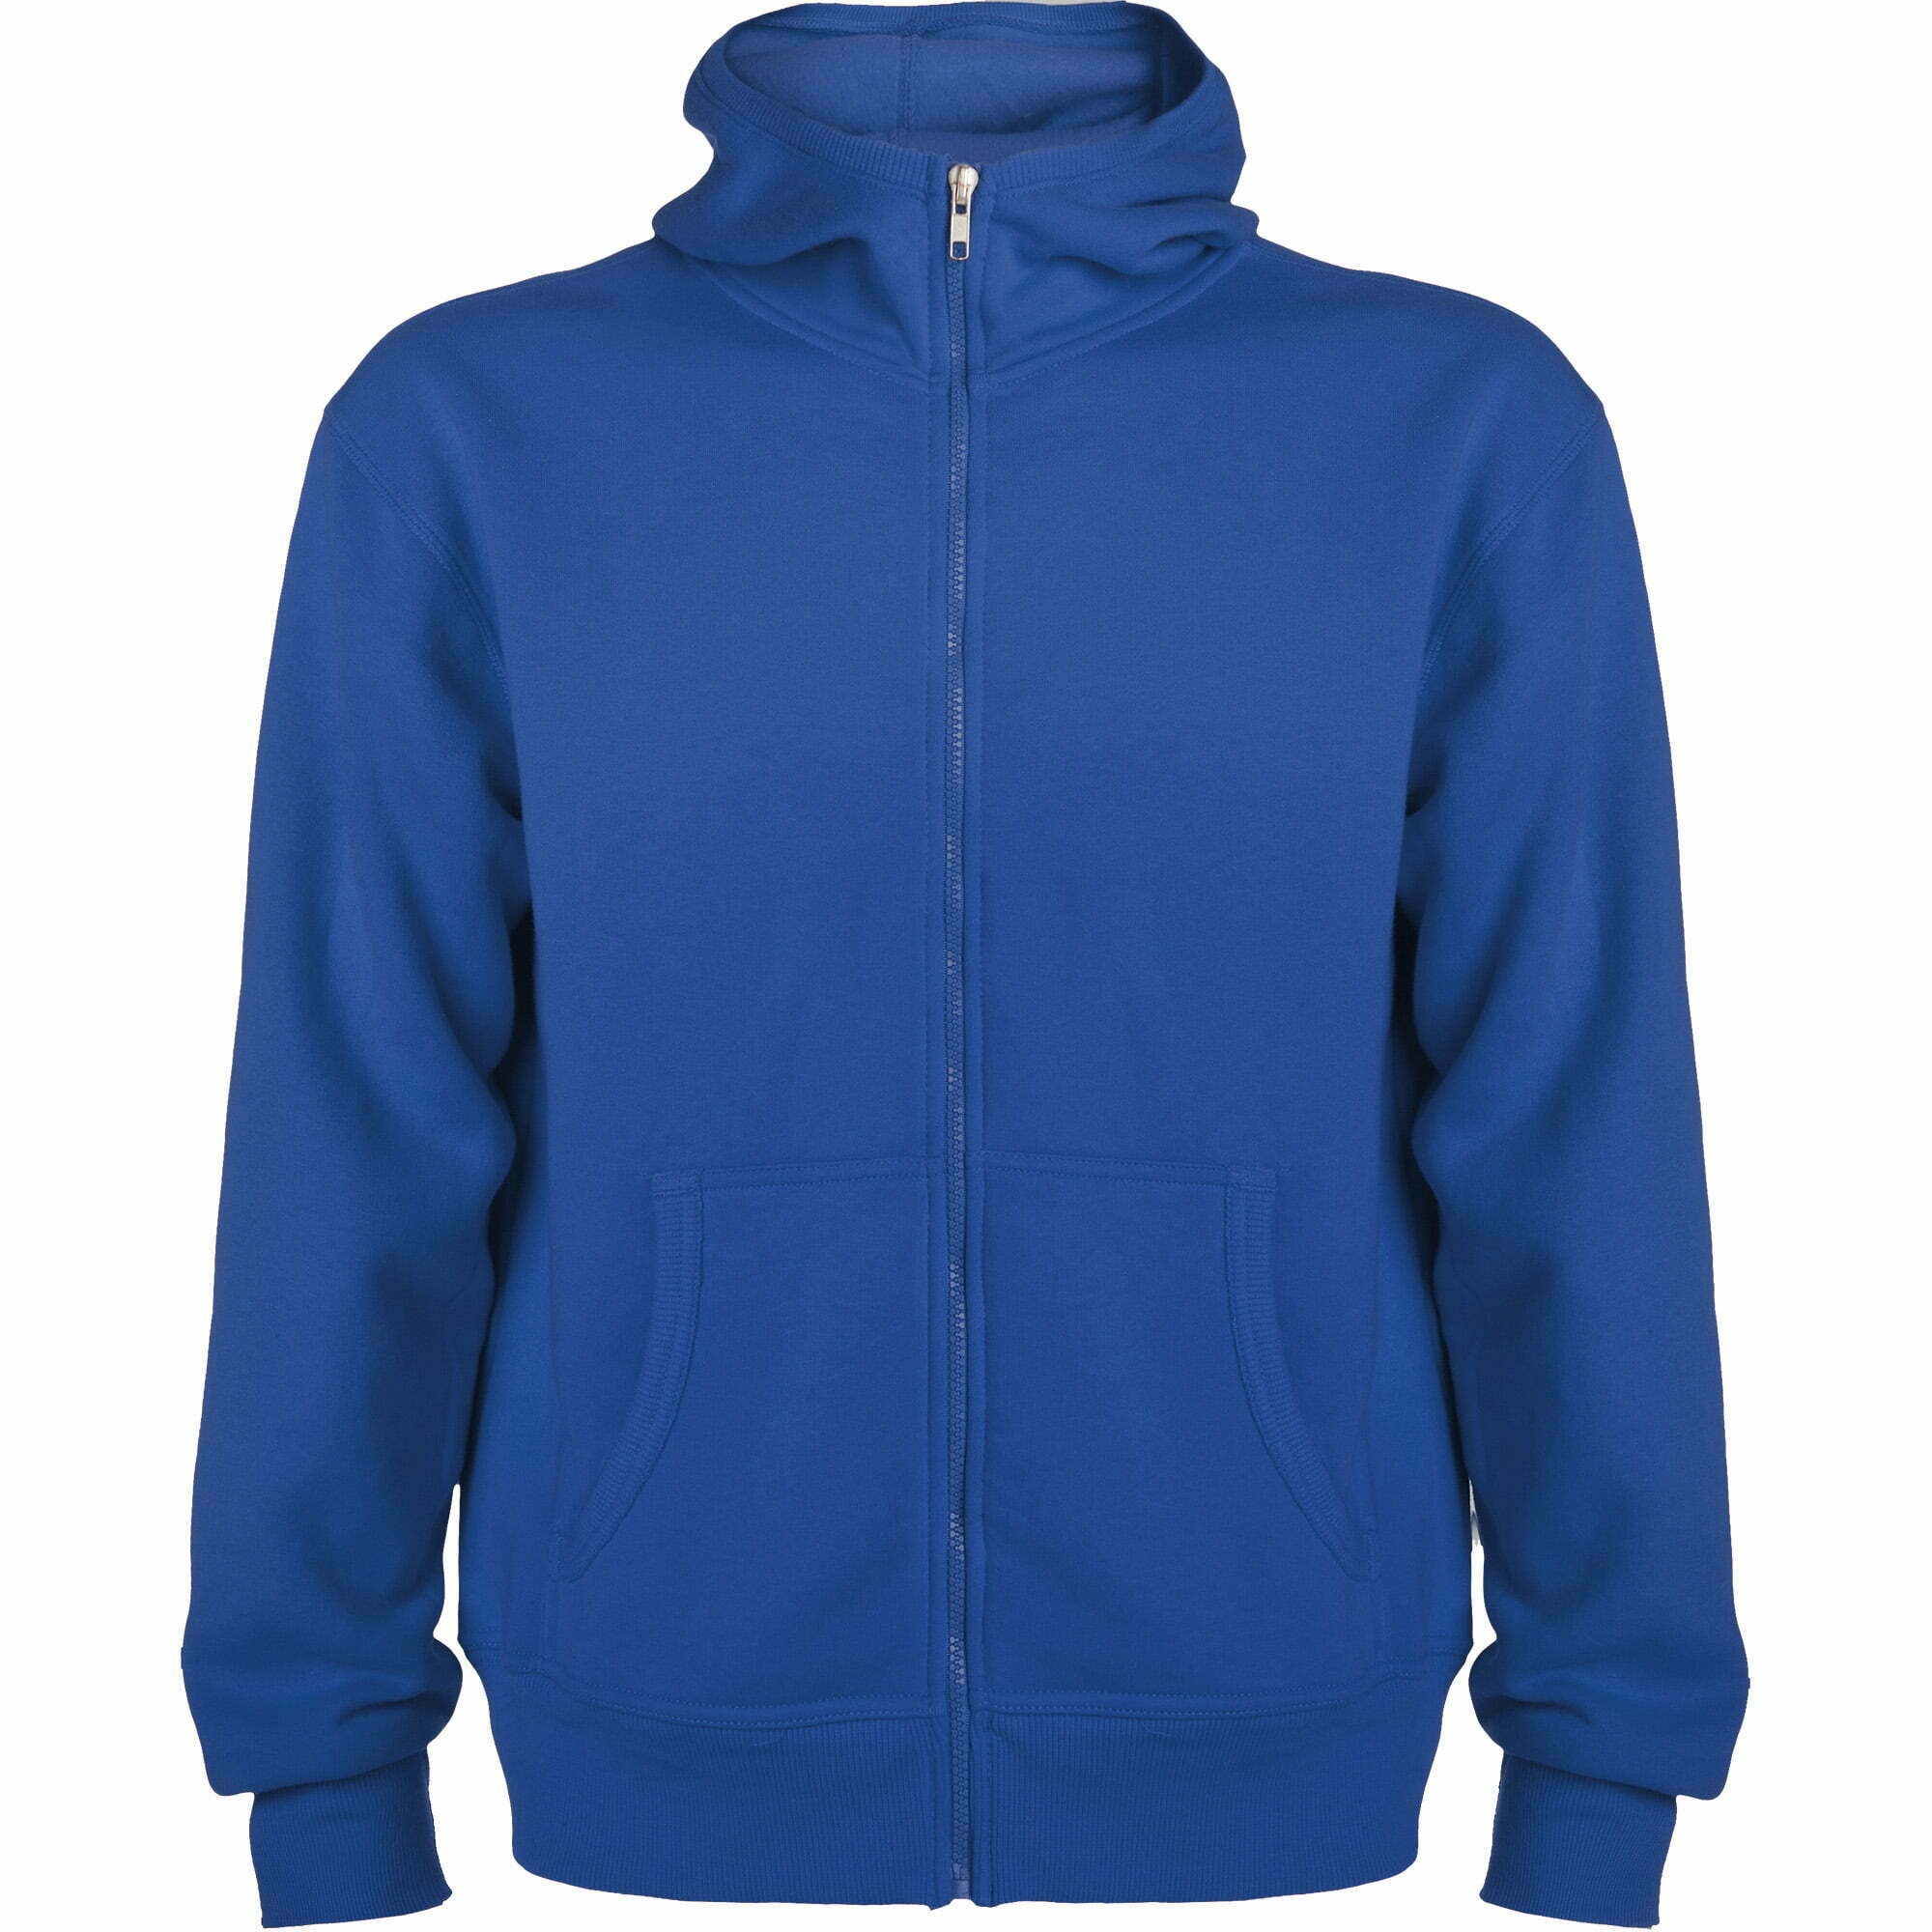 Sudadera infantil capucha color azul - Montblanc 166421